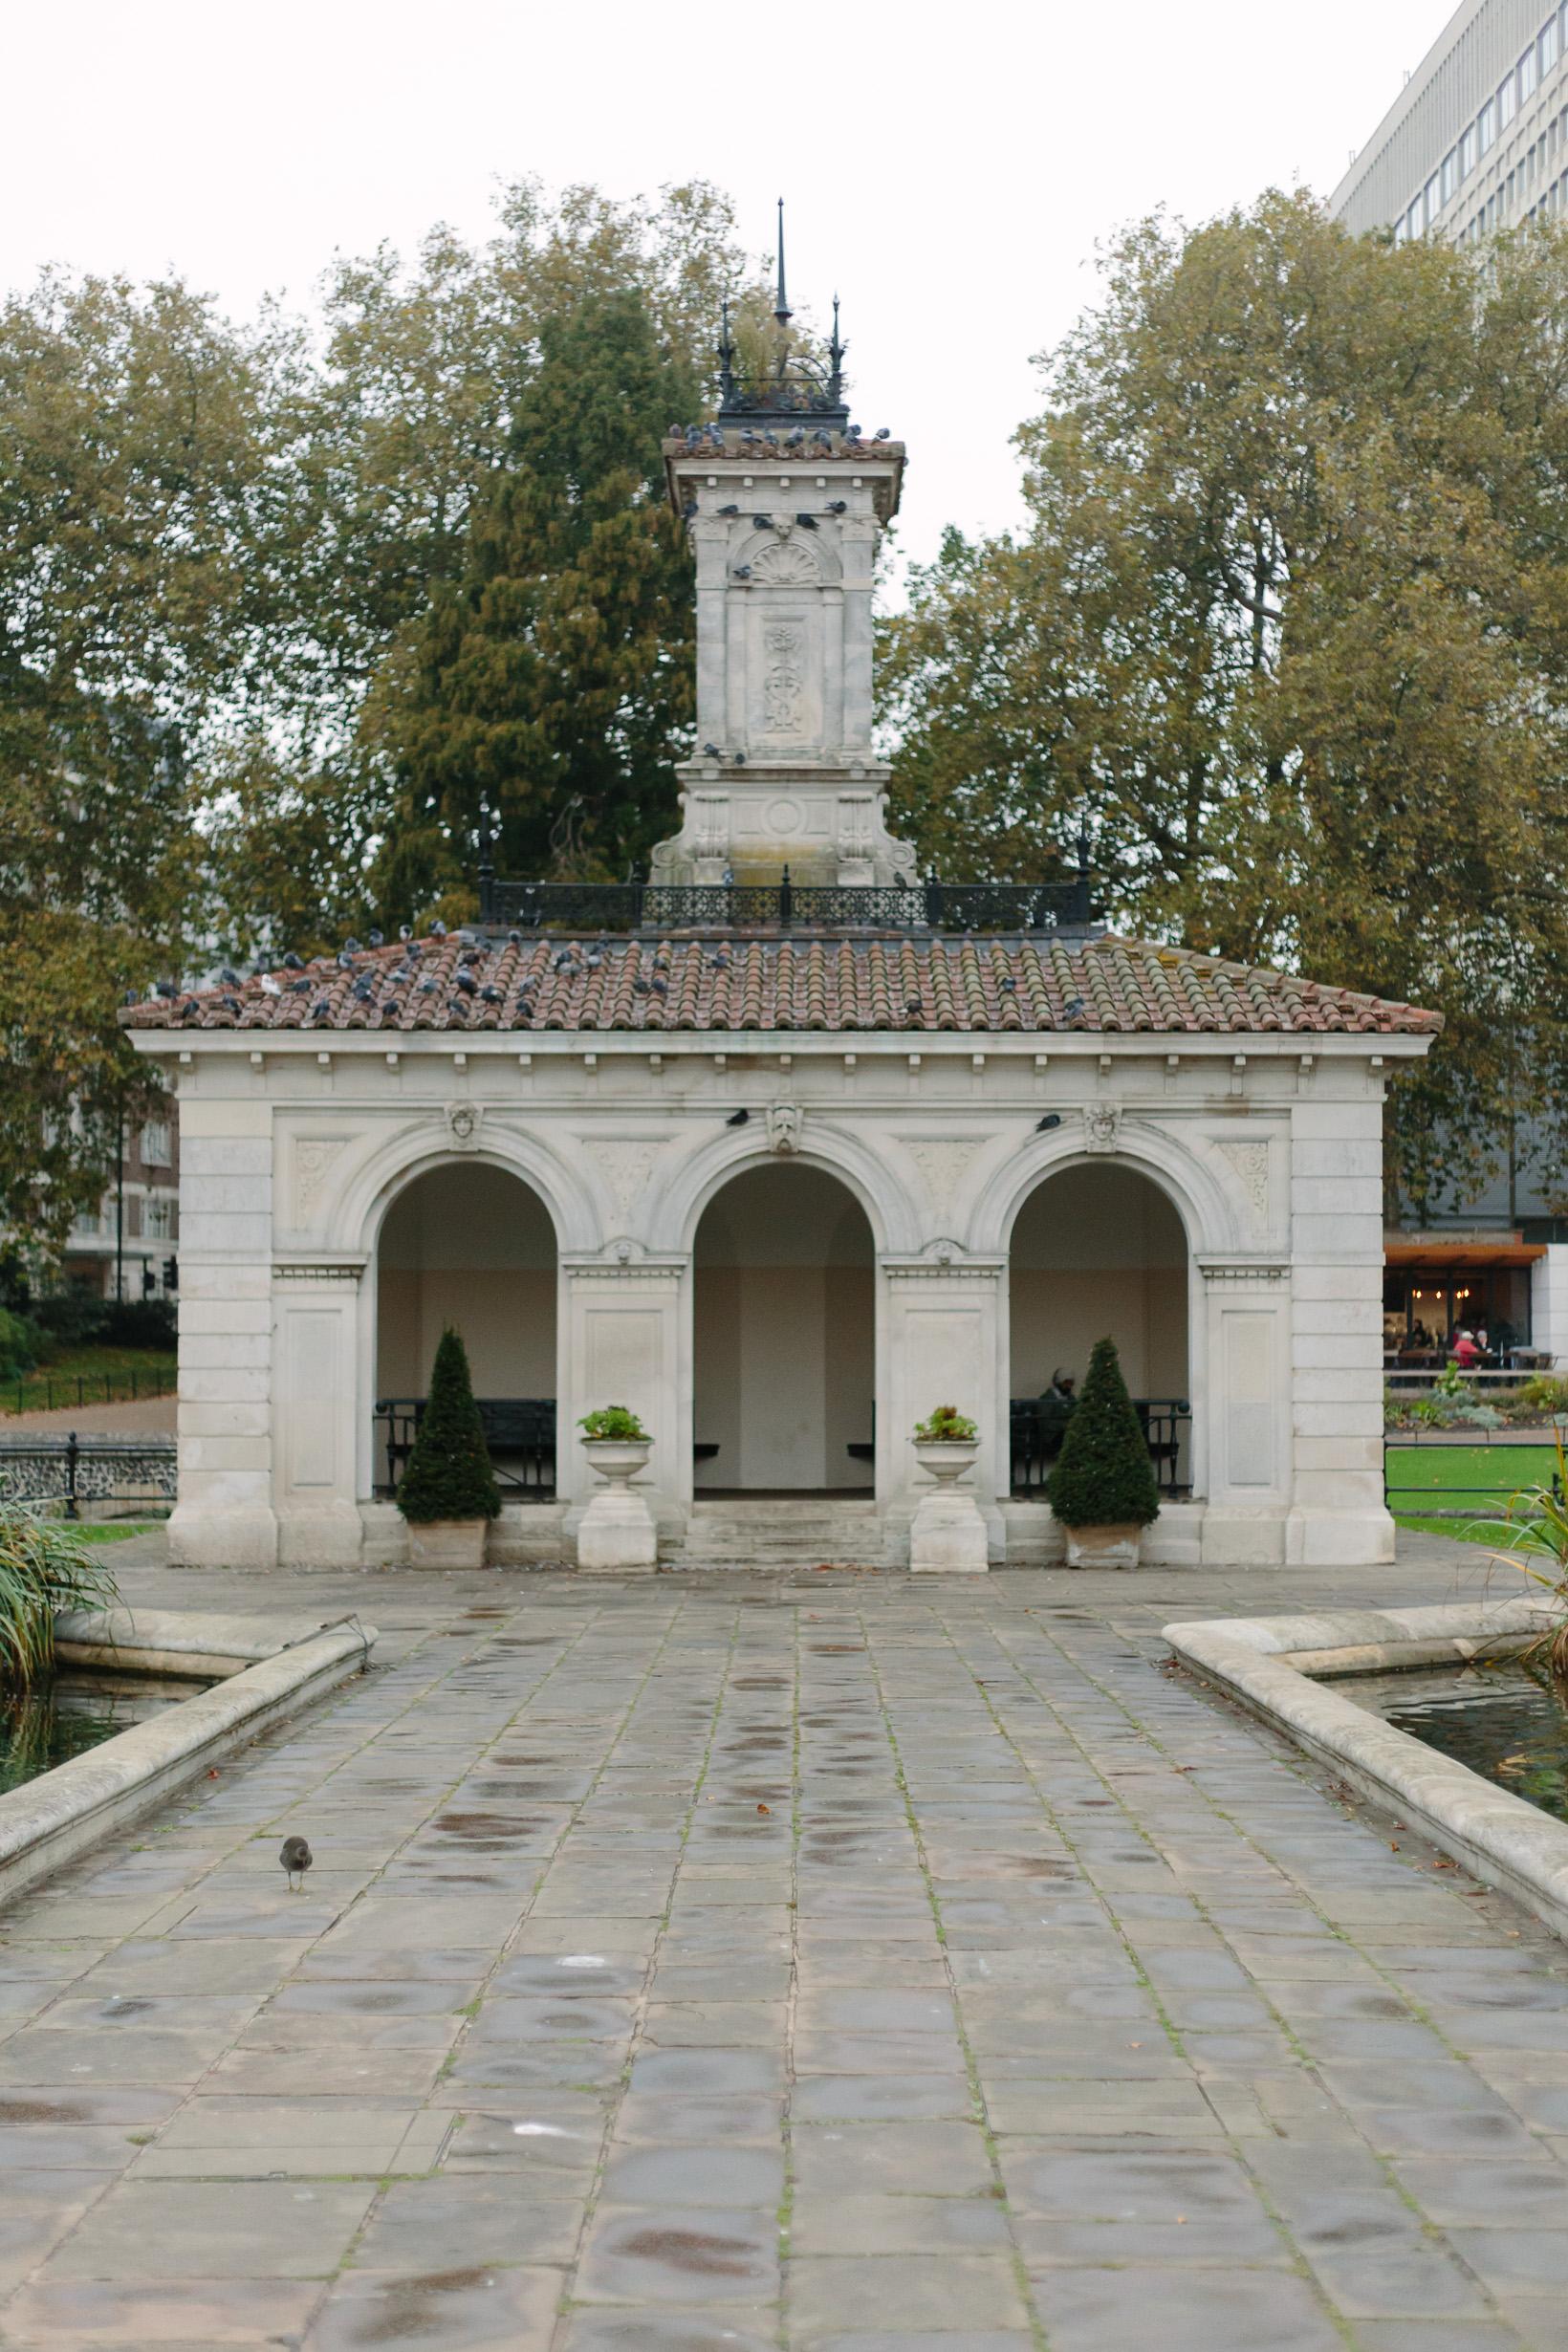 fall-in-hyde-park-london-4144